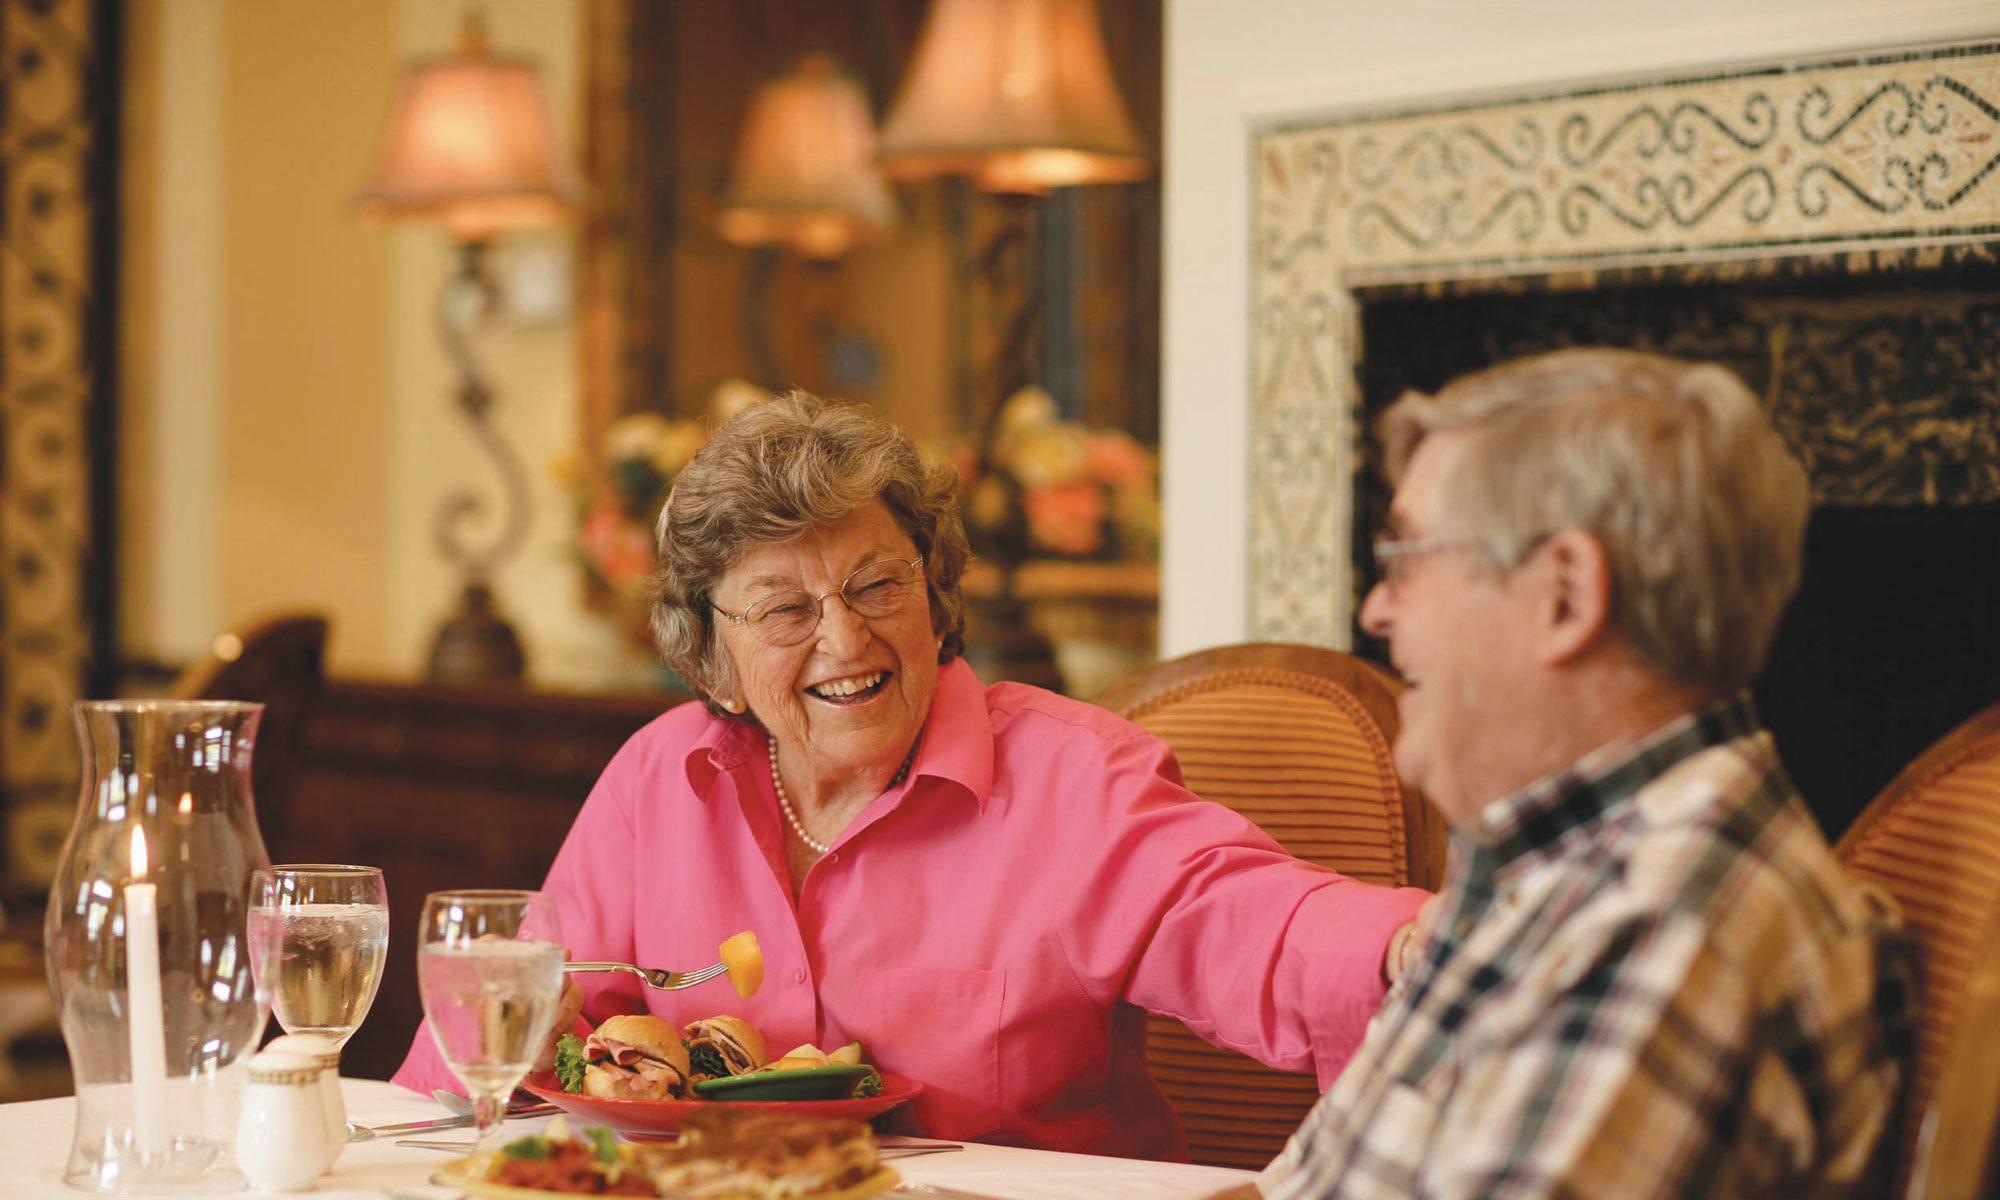 Exquisite senior living facility located in Palm Beach Gardens